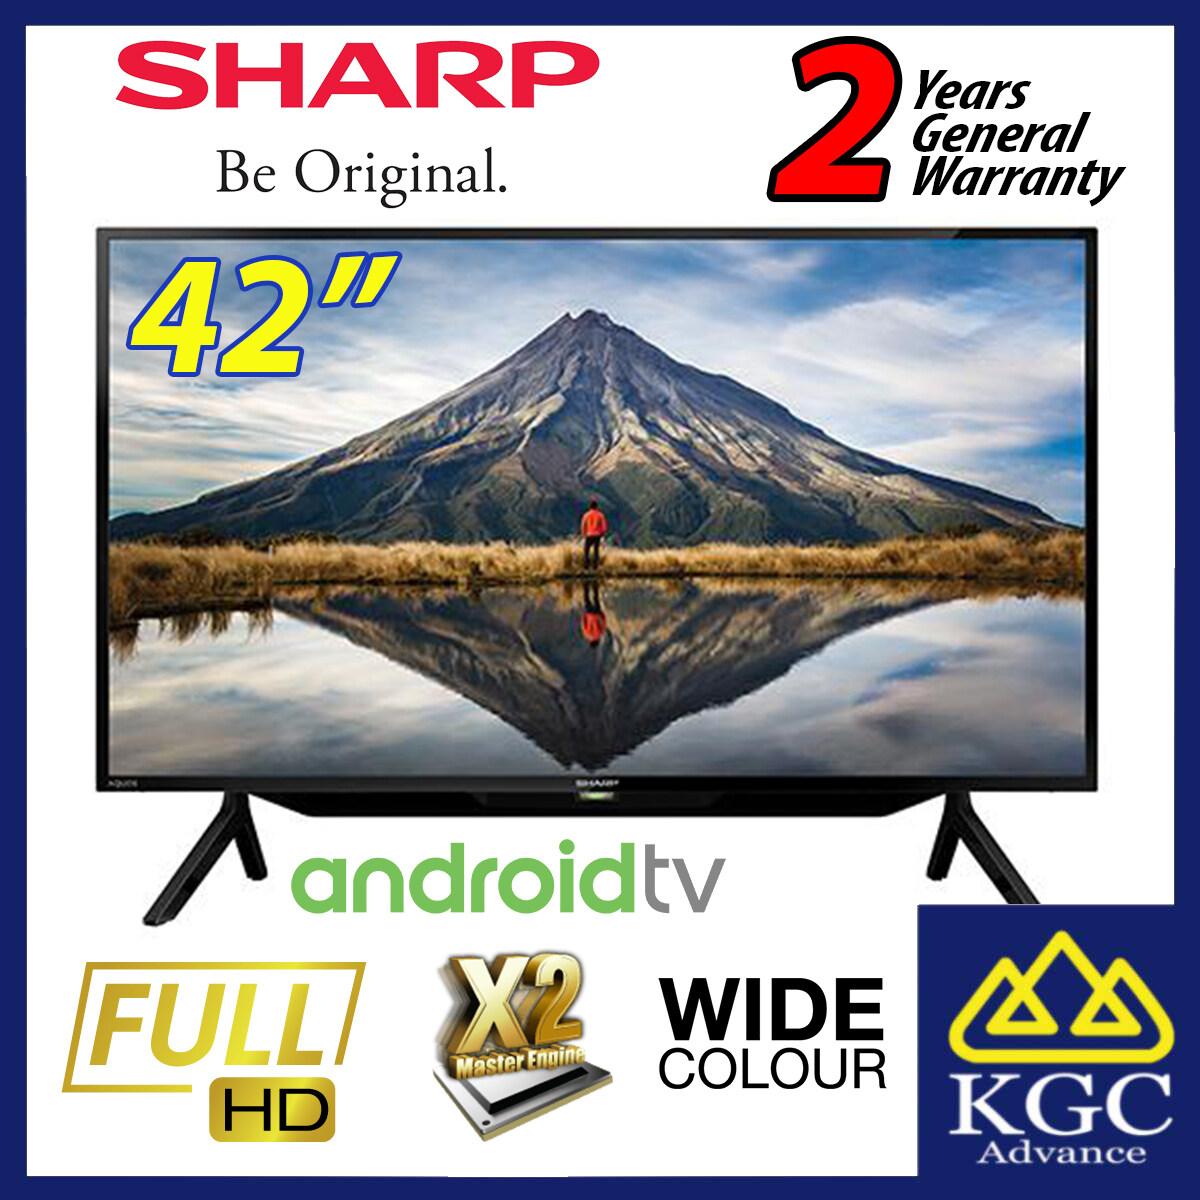 Sharp 42 inch Android Full HD LED TV 2TC42BG1X